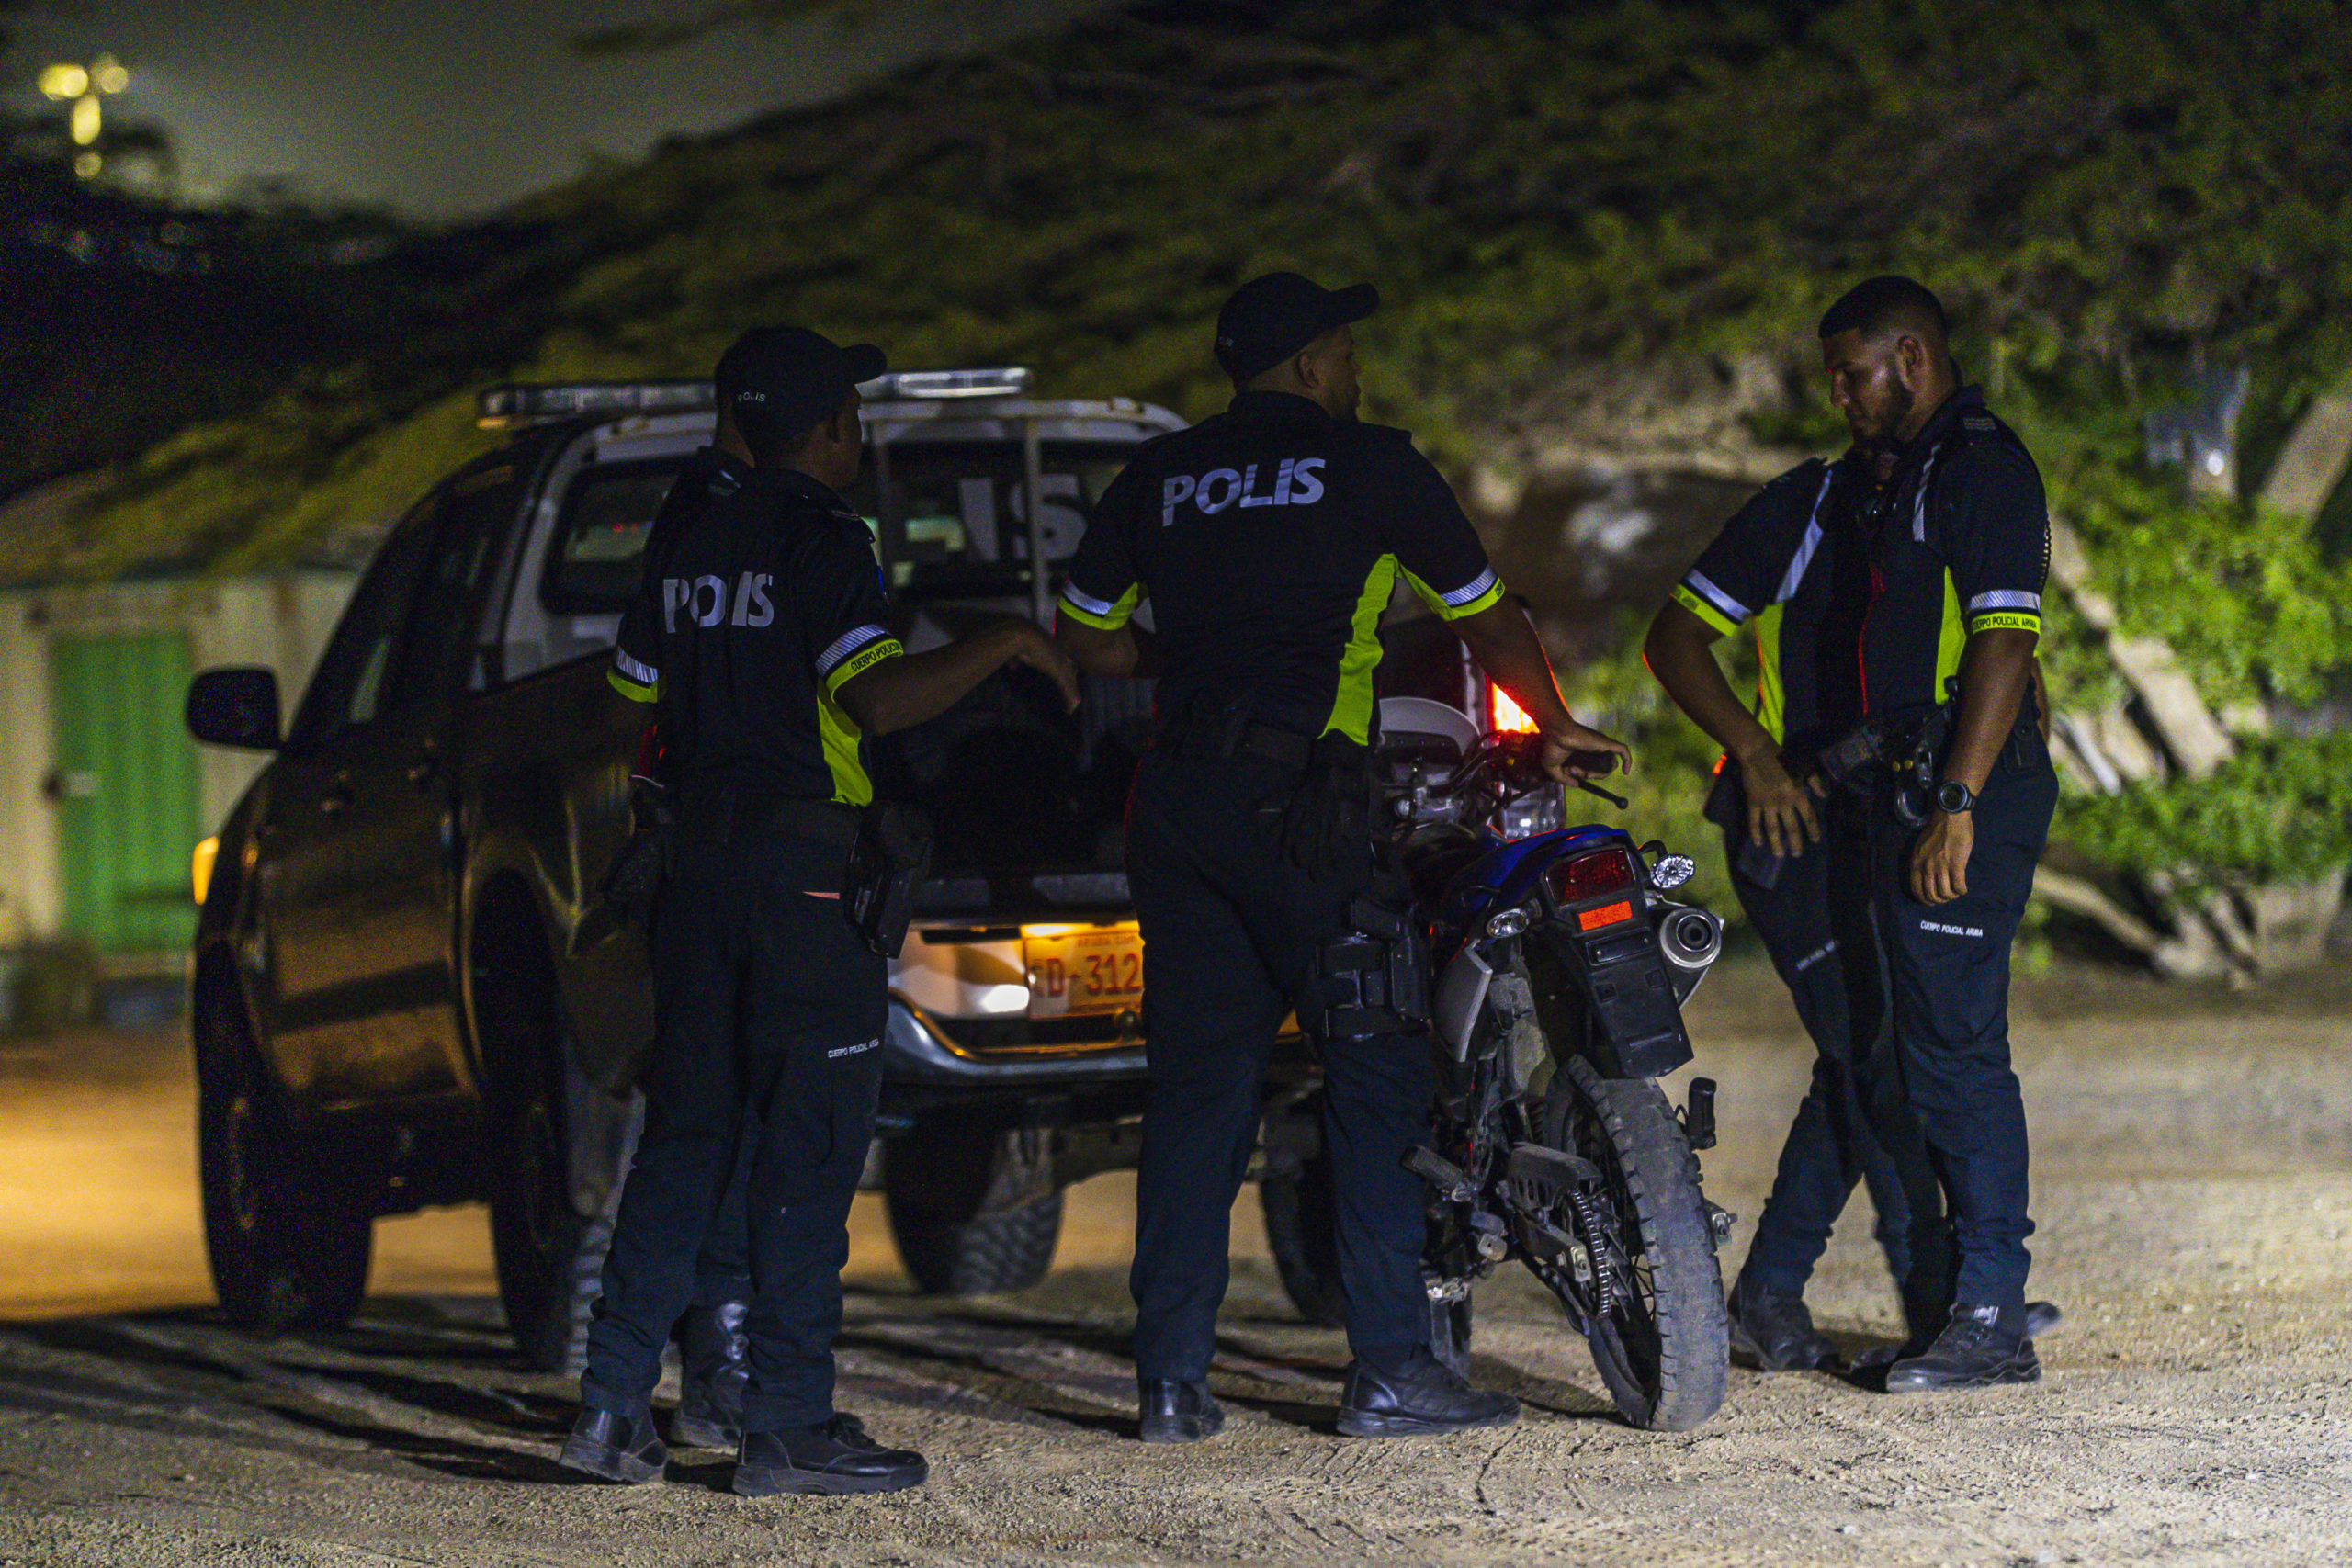 Tres detencion: Hobennan a bay scol diasabra pa huma marihuana